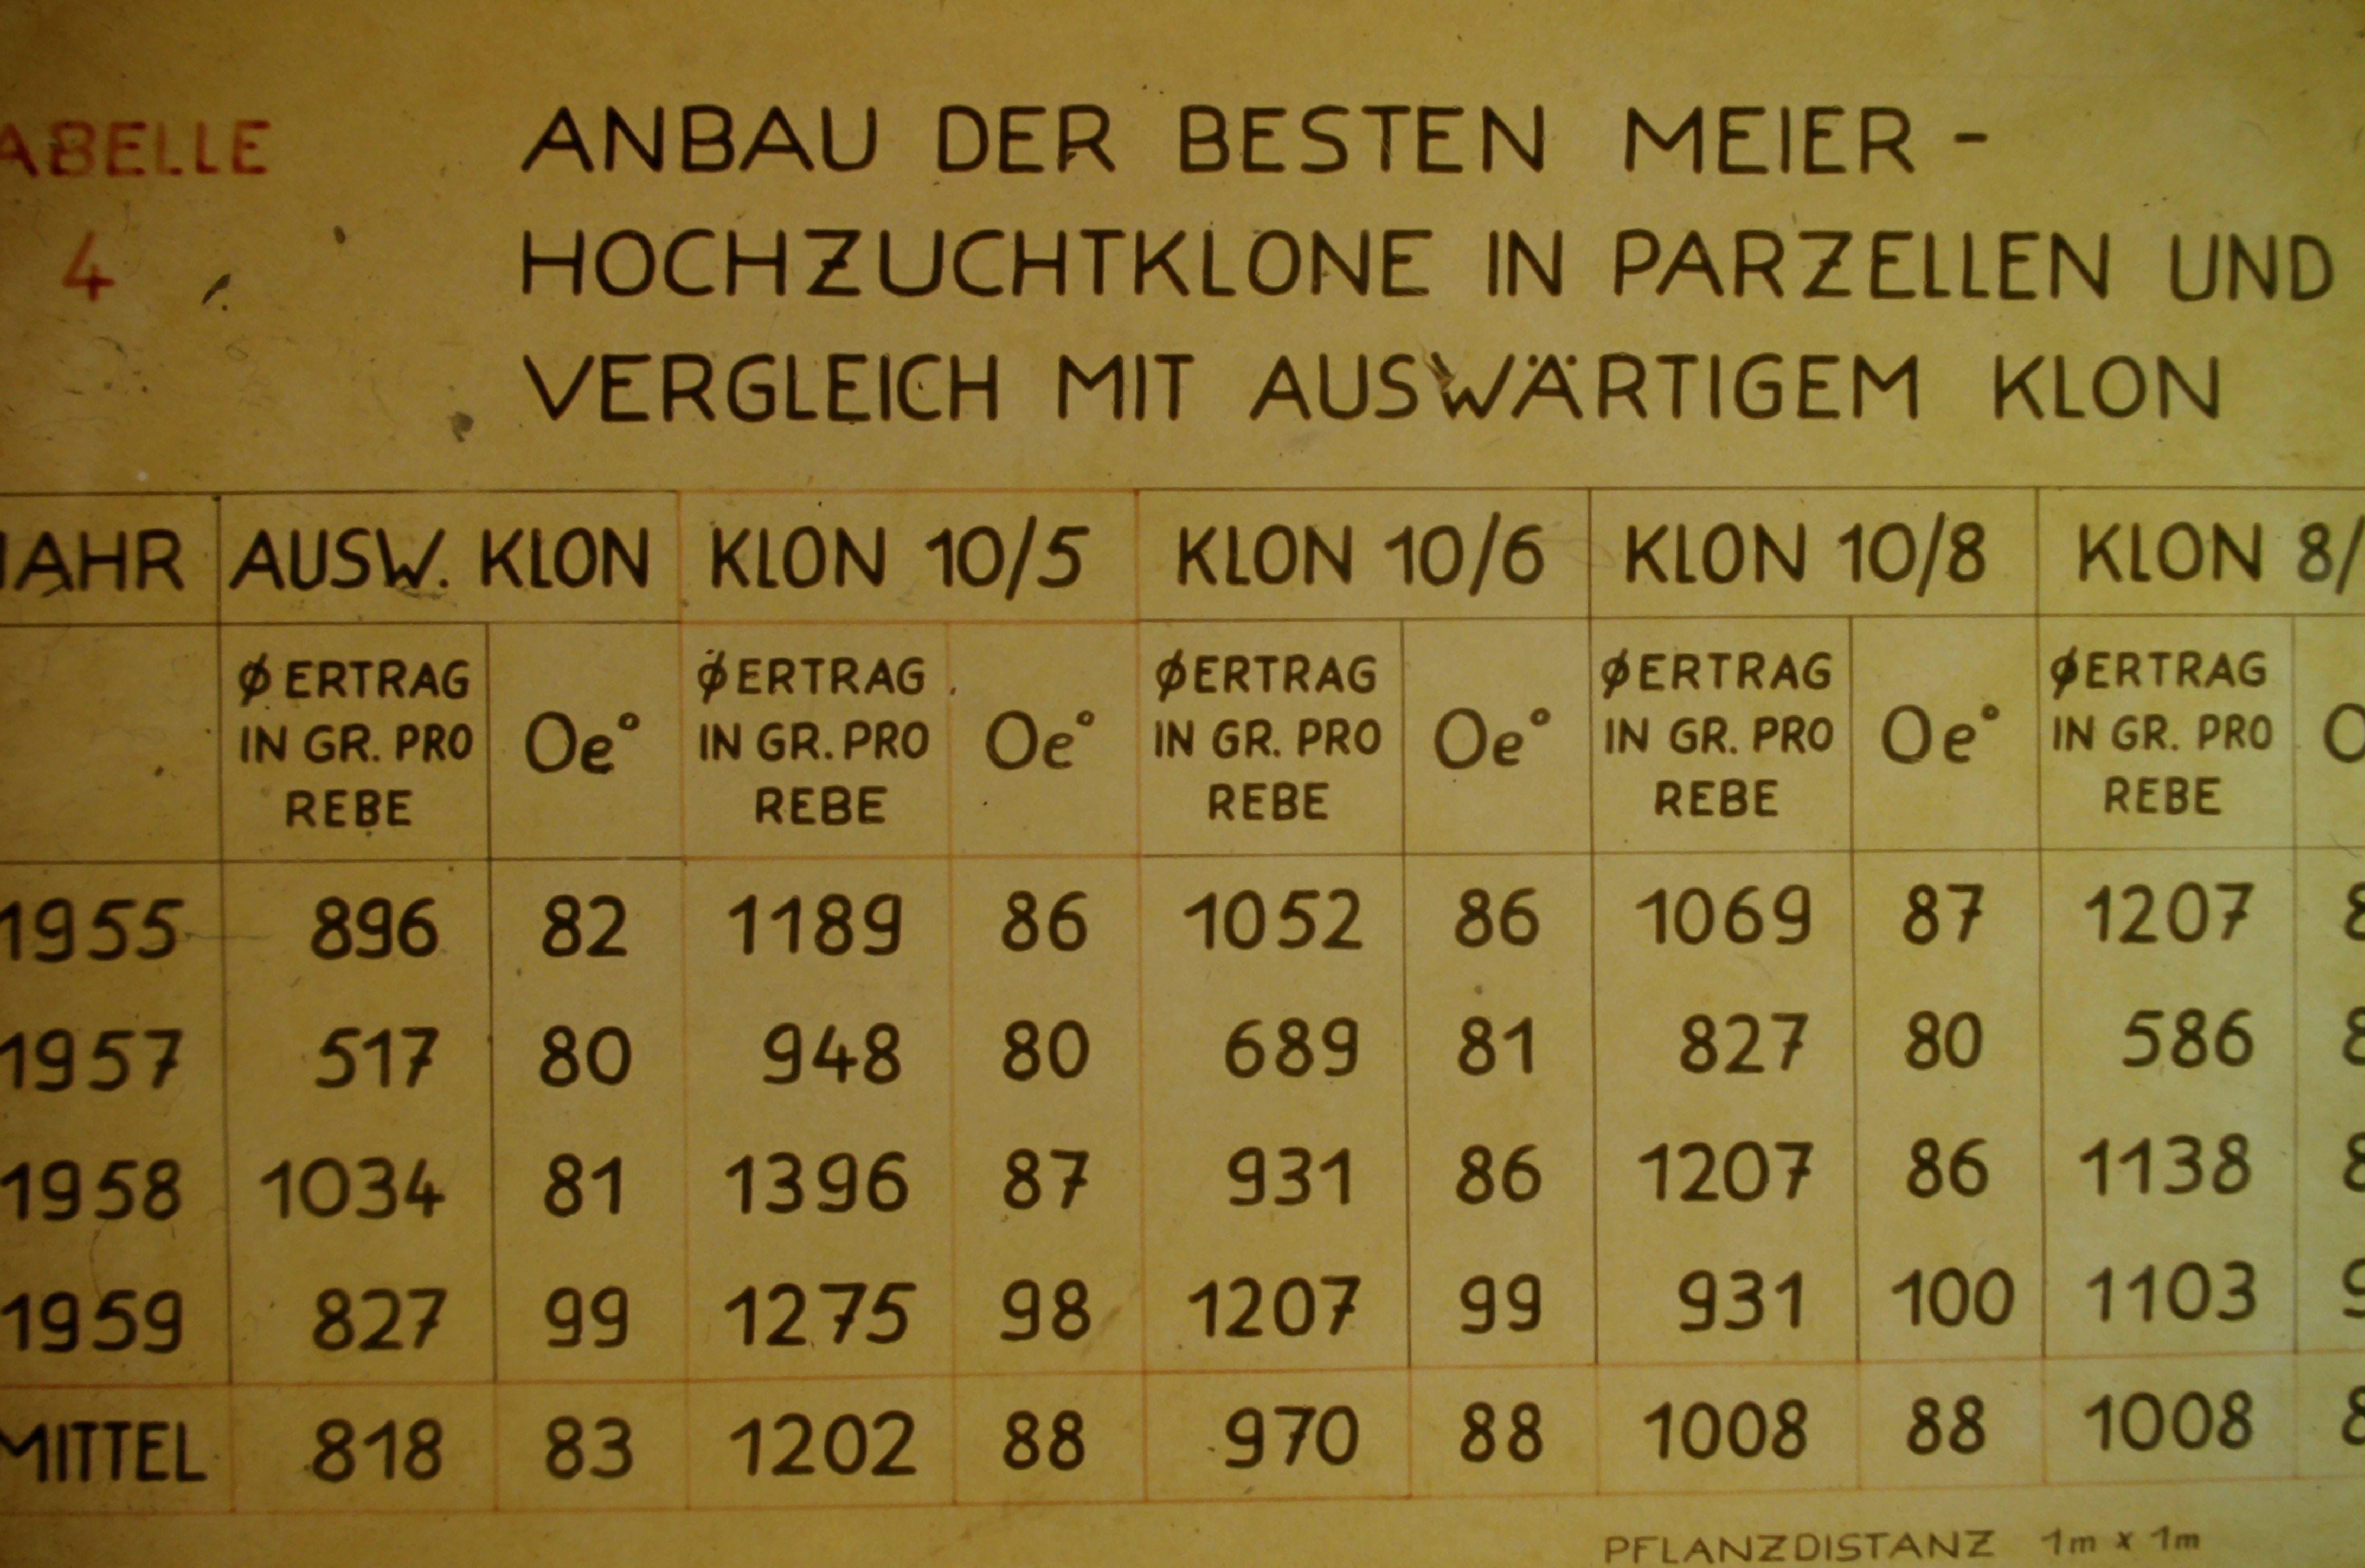 Albert Meier führte genaue Tabellen.